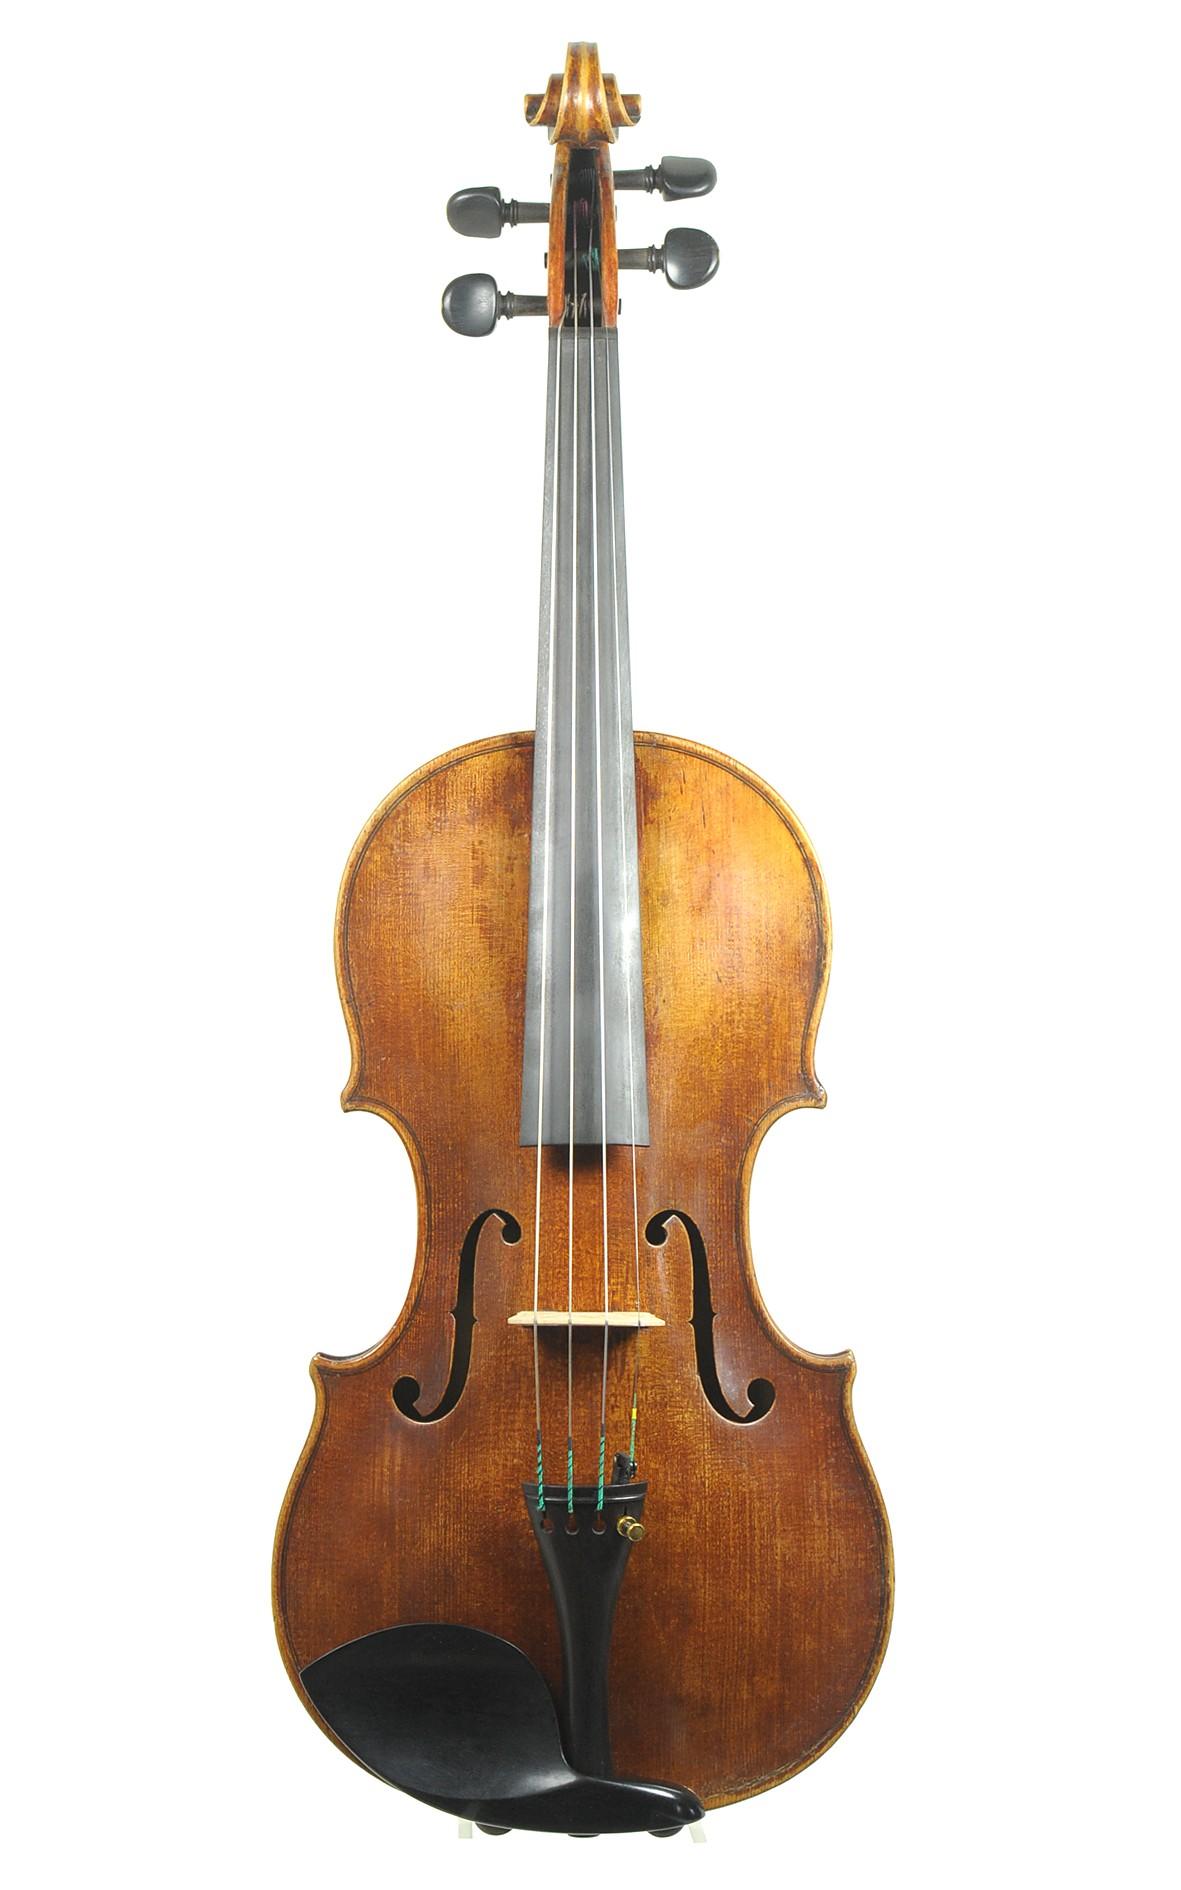 Georg Klotz violin (Georg Kloz) - top